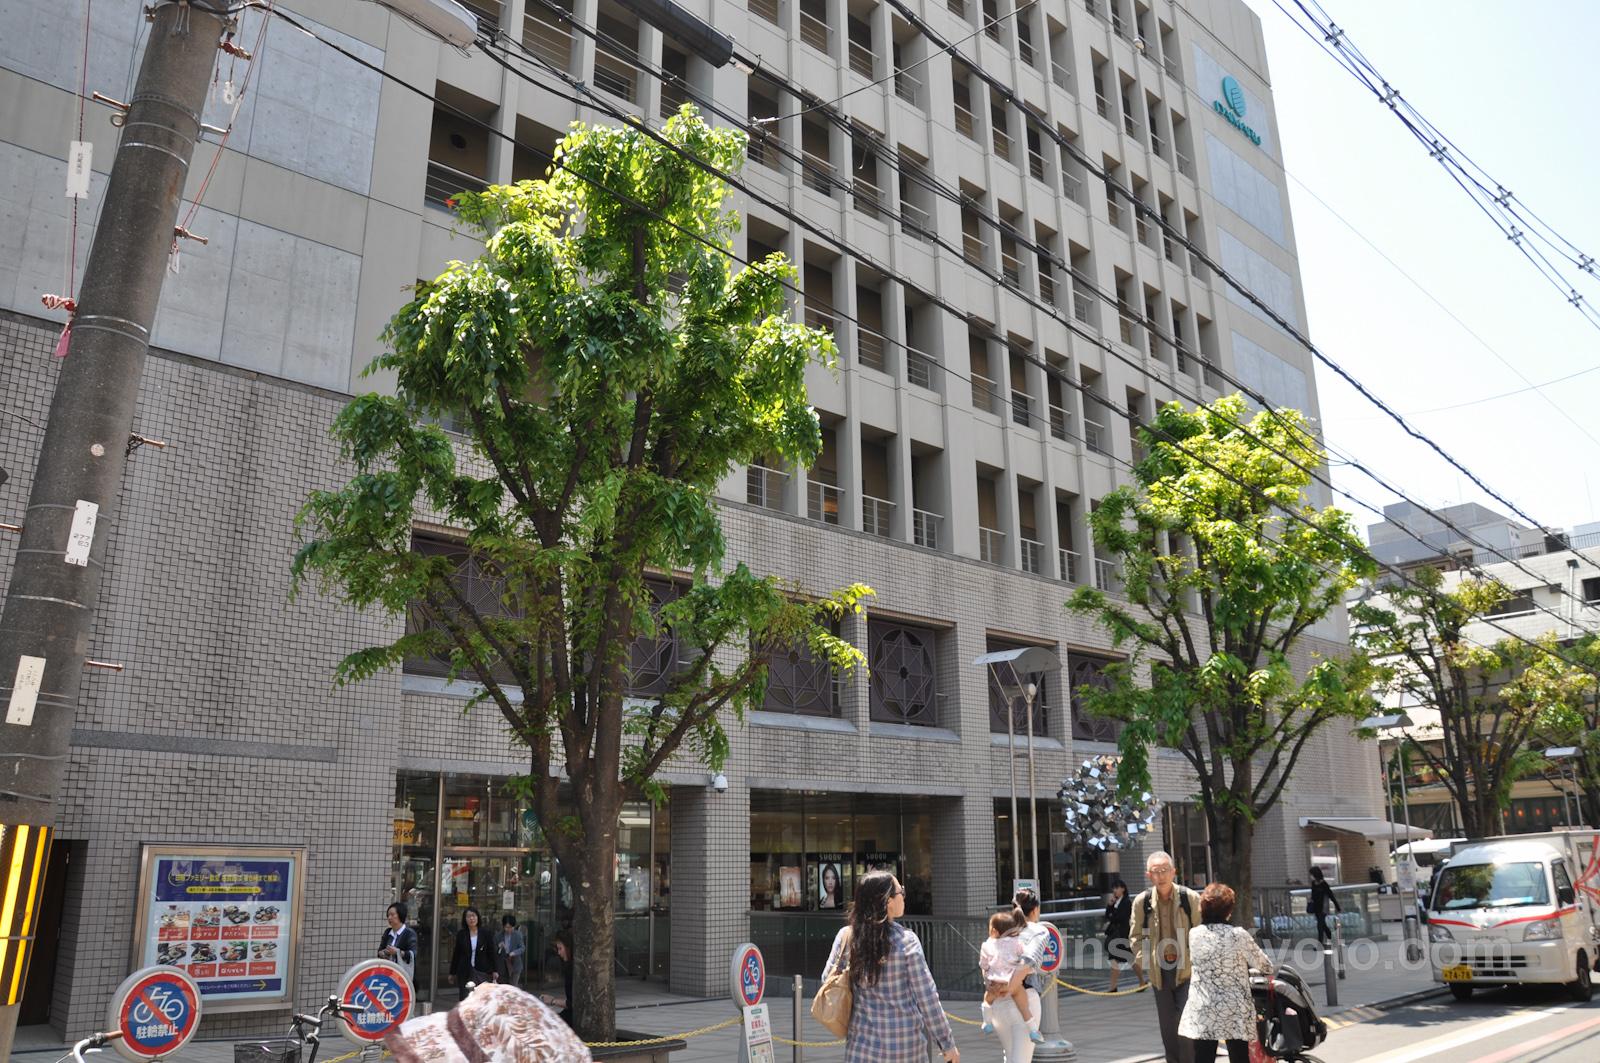 Daimaru Department Store, Kyoto